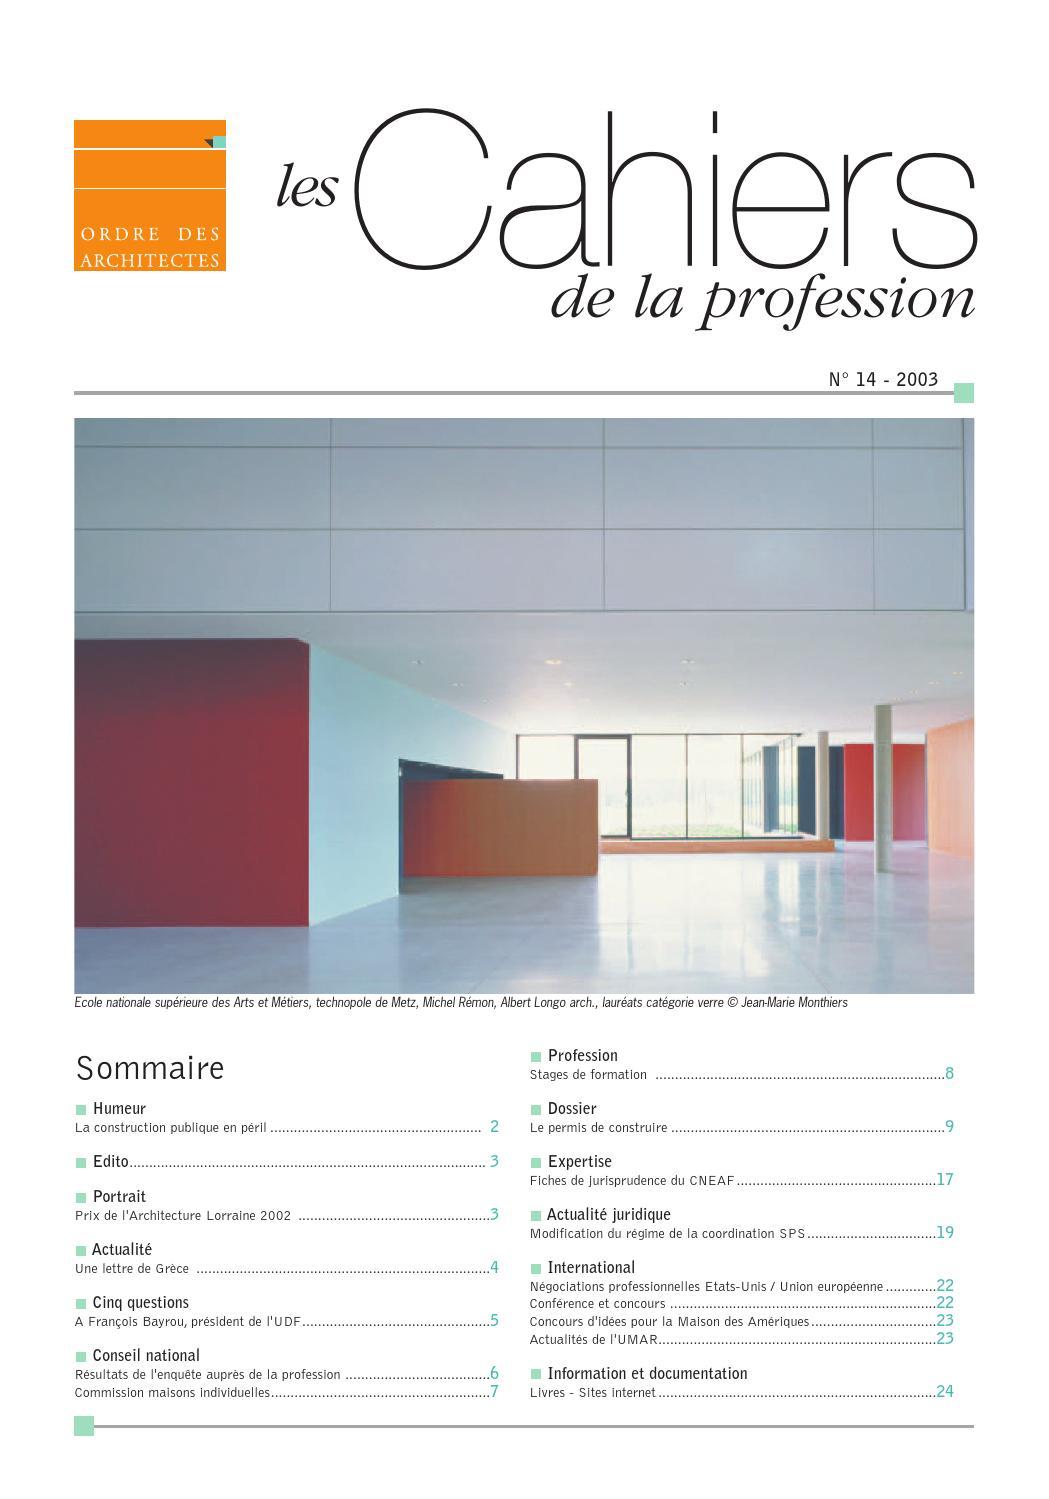 Les Cahiers De La Profession N 14 By Cnoa Issuu